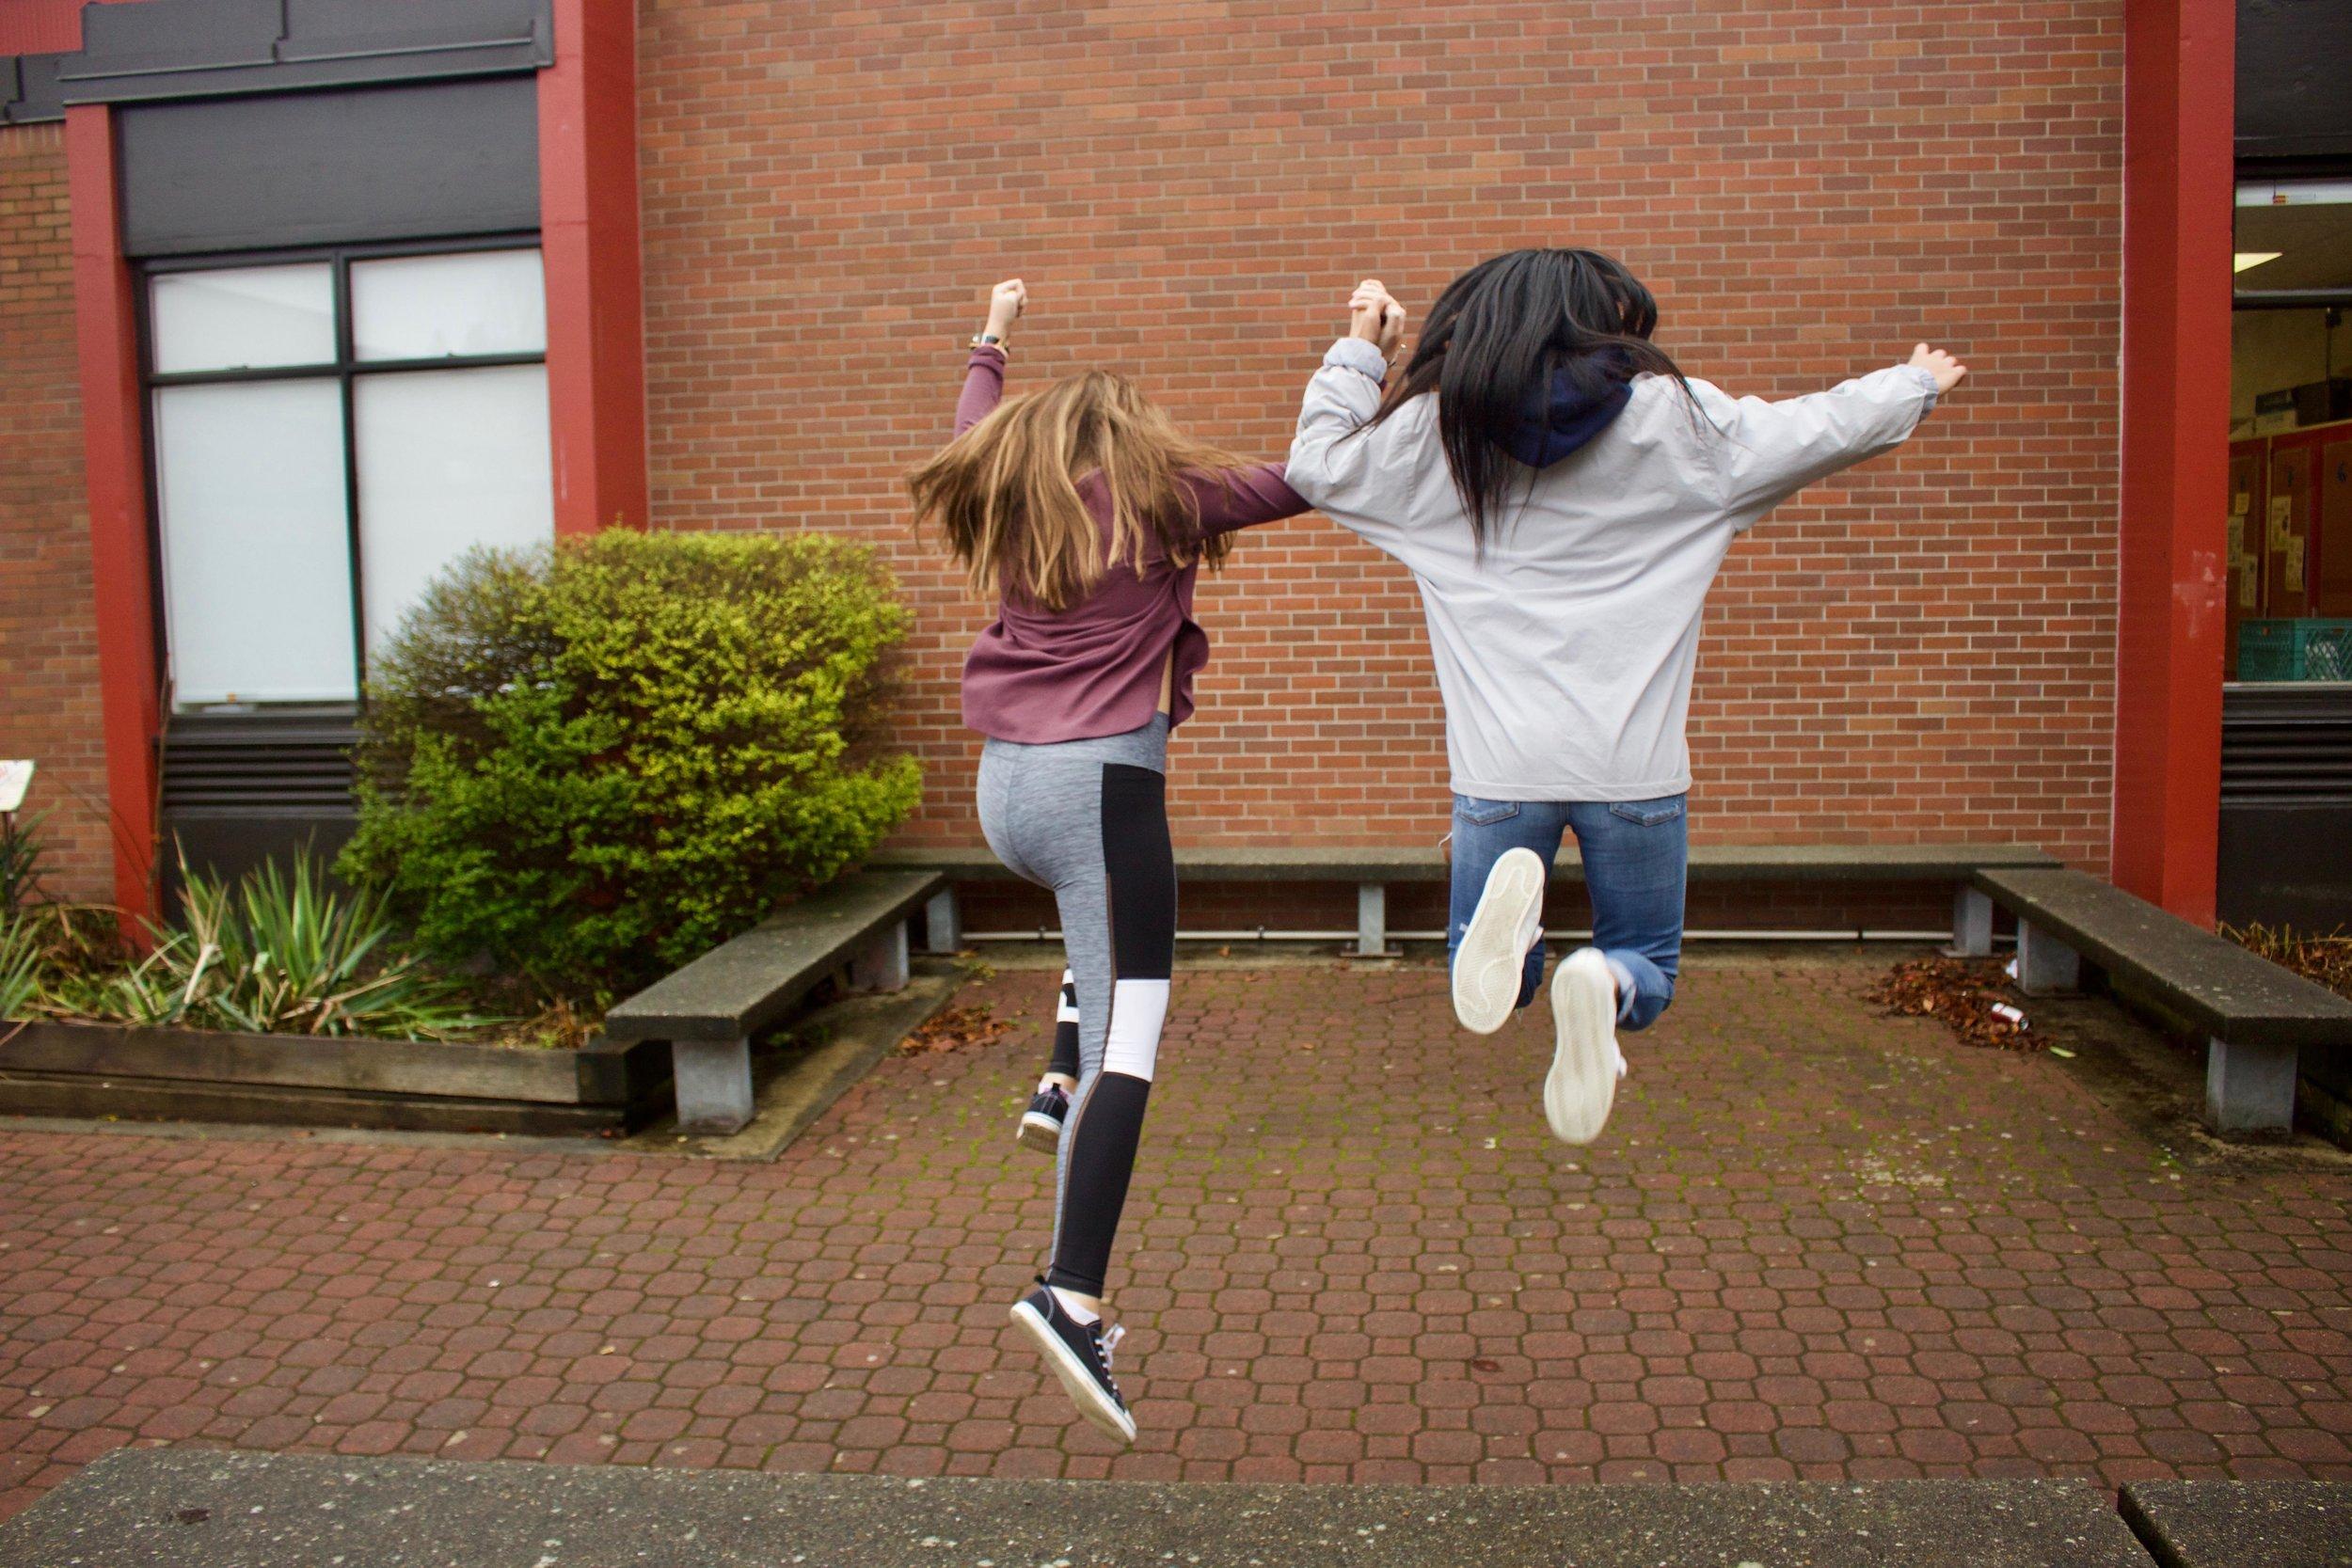 2girlsjumping.jpg